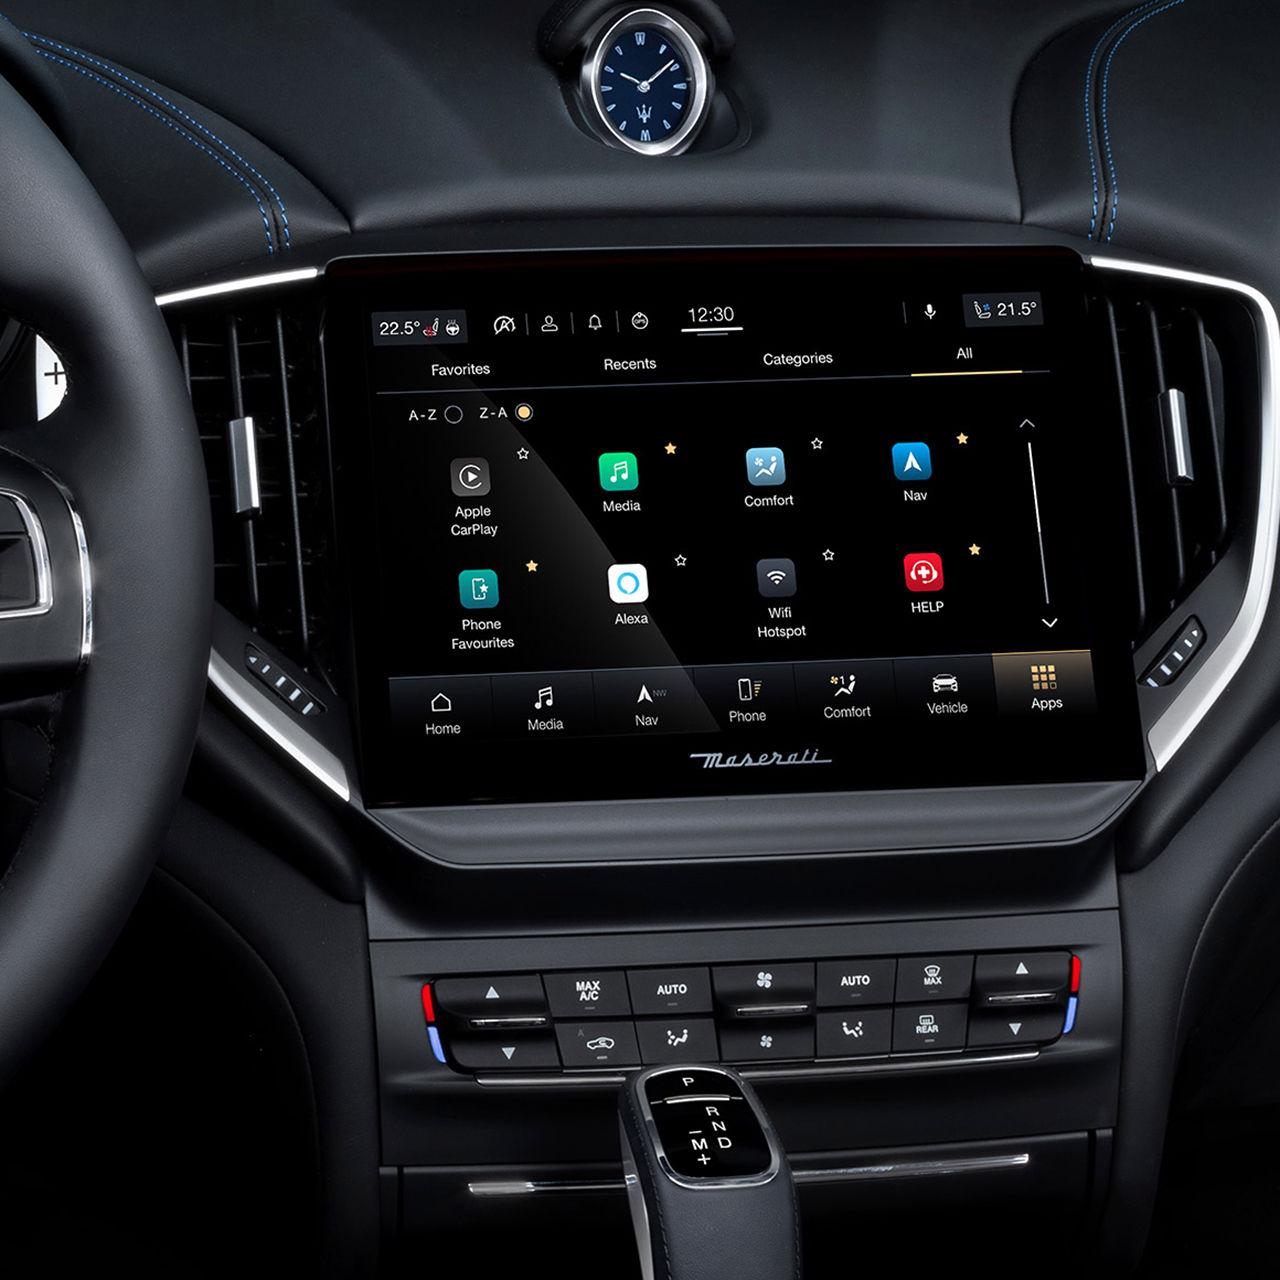 Maserati Connect - Maserati Ghibli Hybrid's dashboard